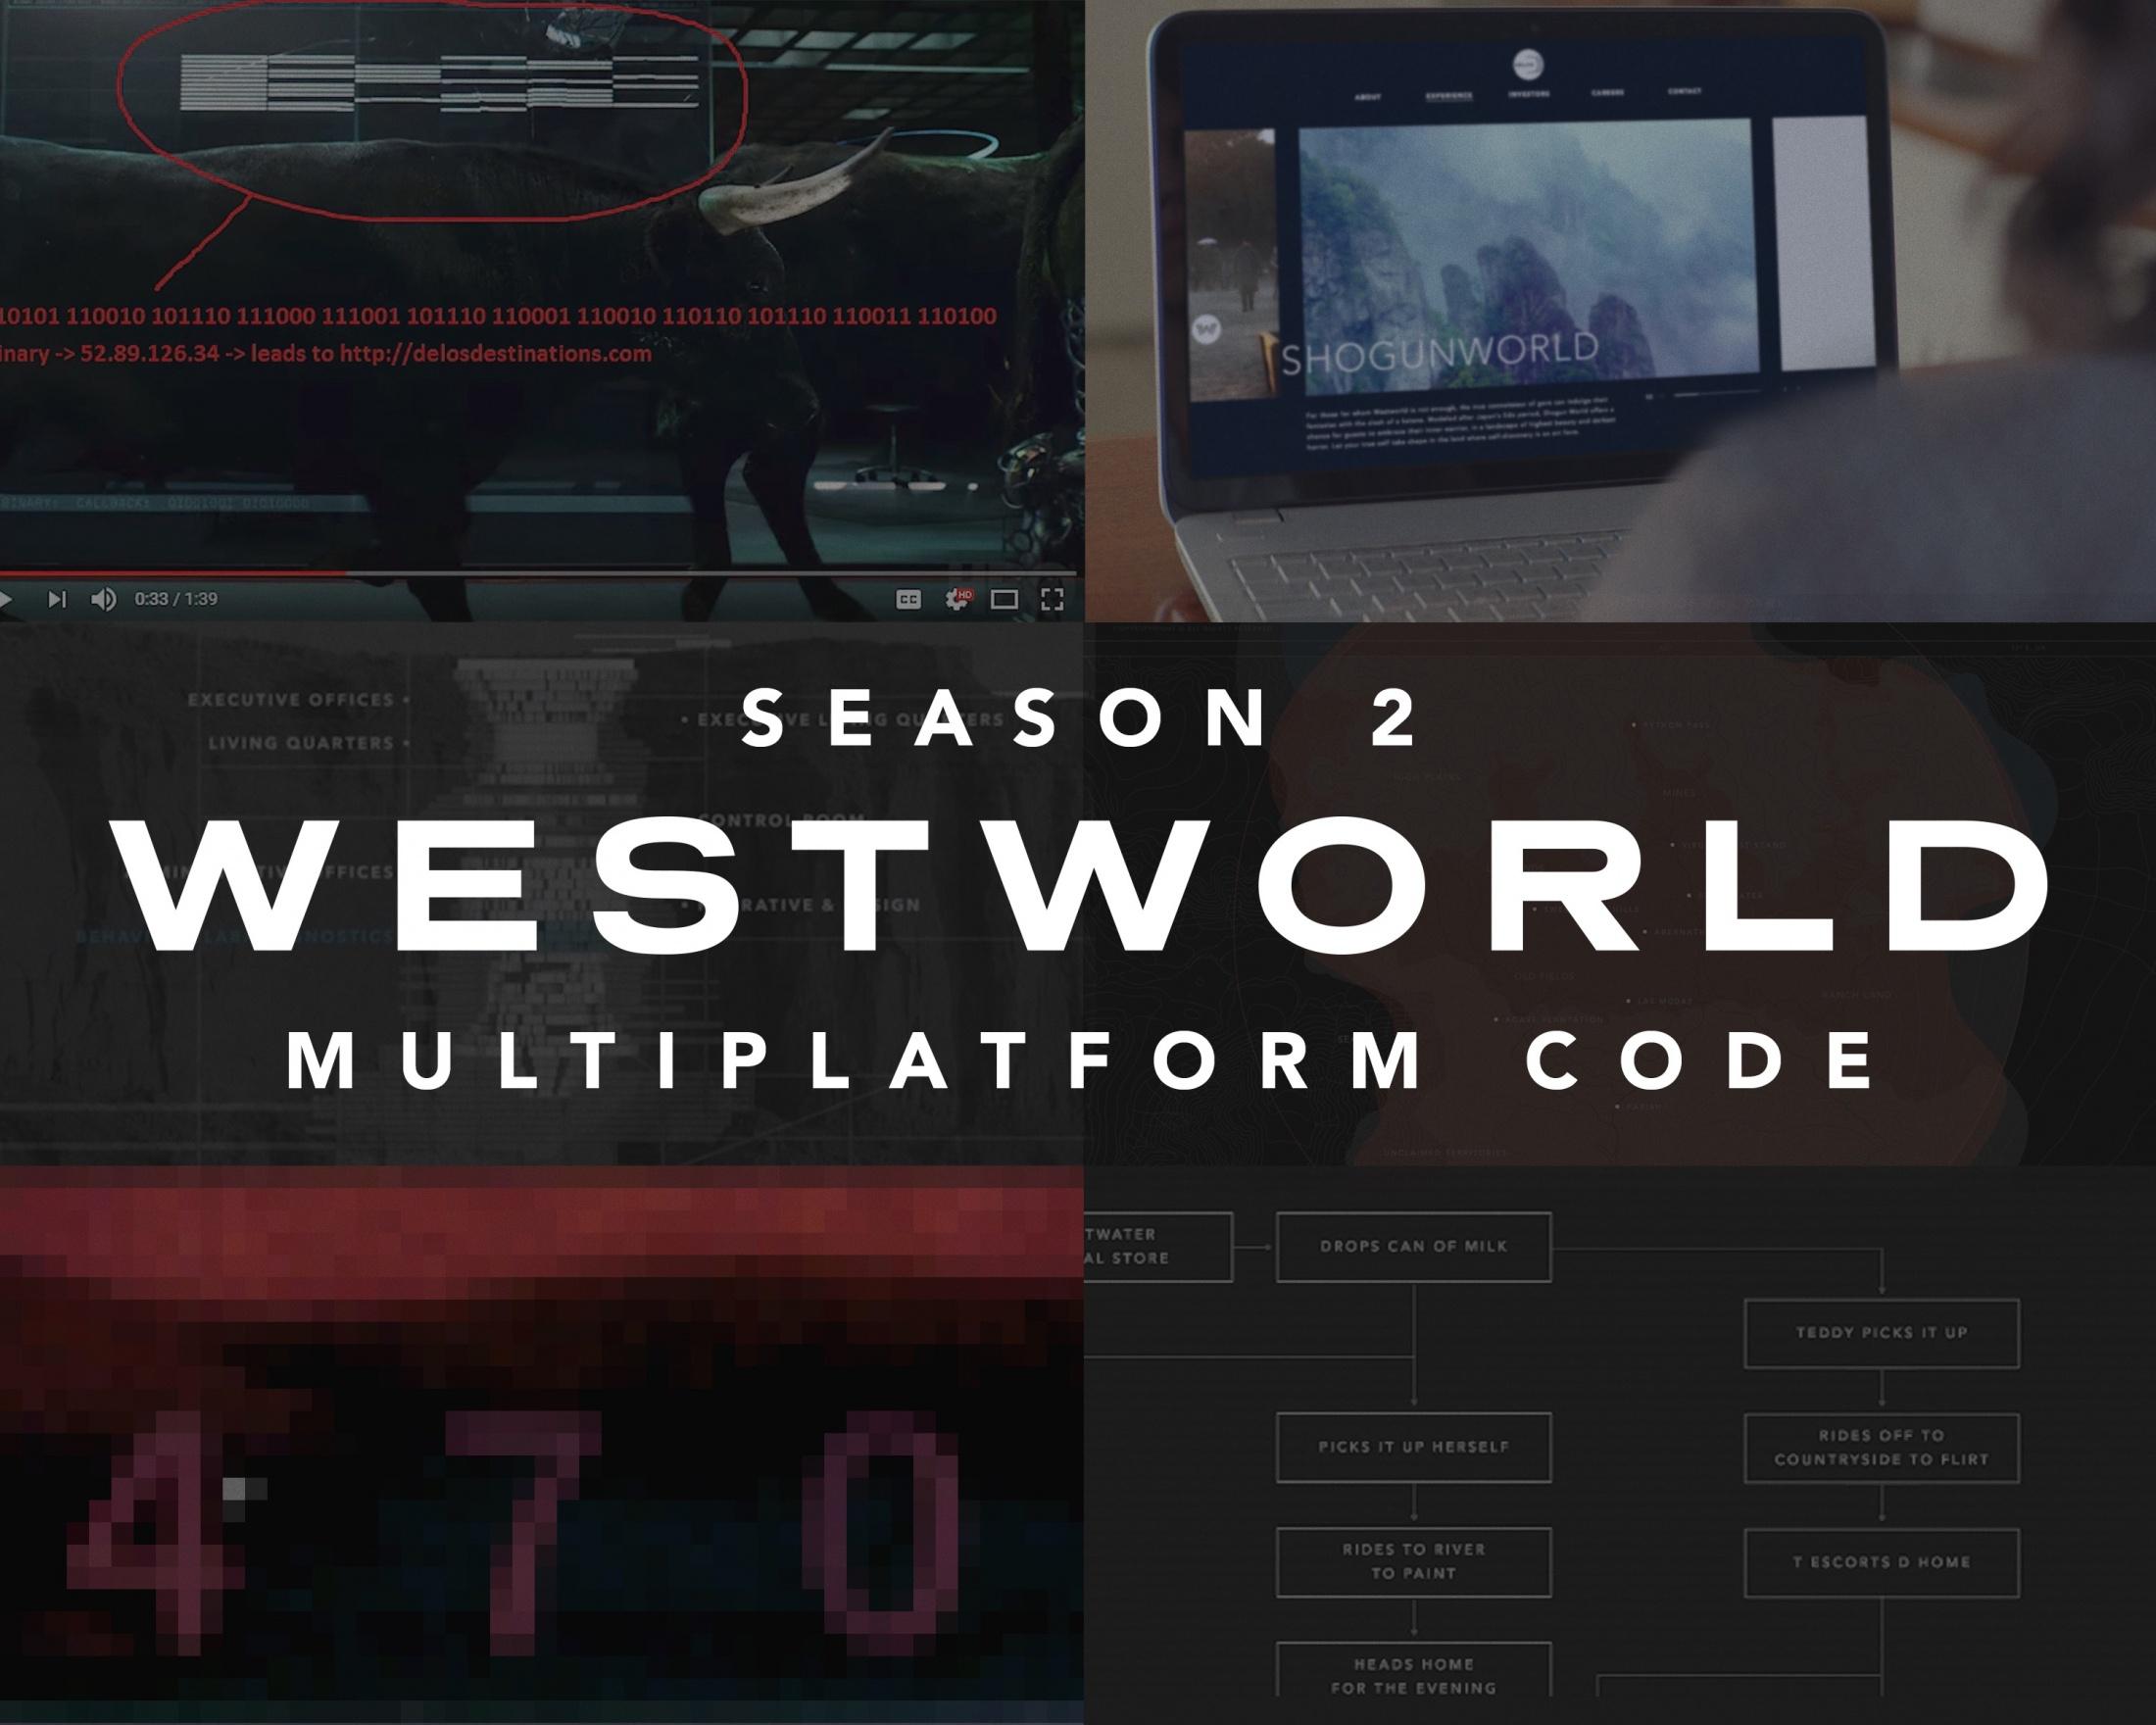 Thumbnail for Westworld Season 2 Code Campaign